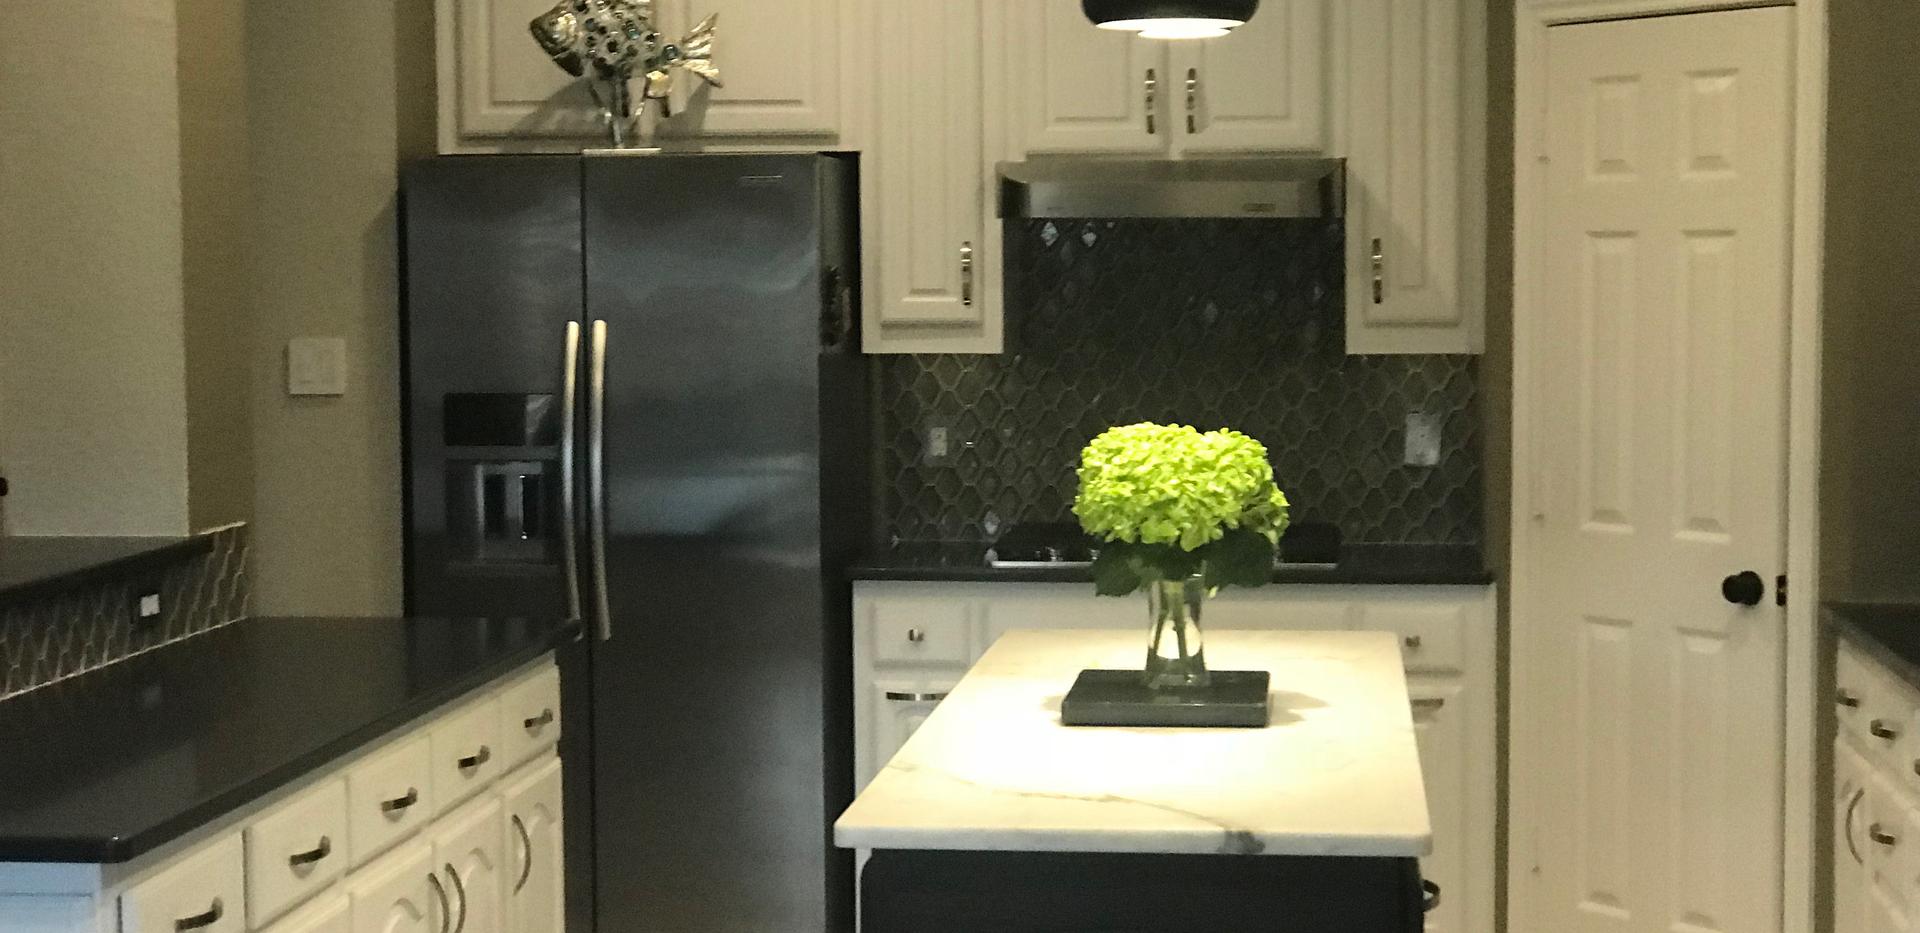 Black quartz countertop kitchen.png